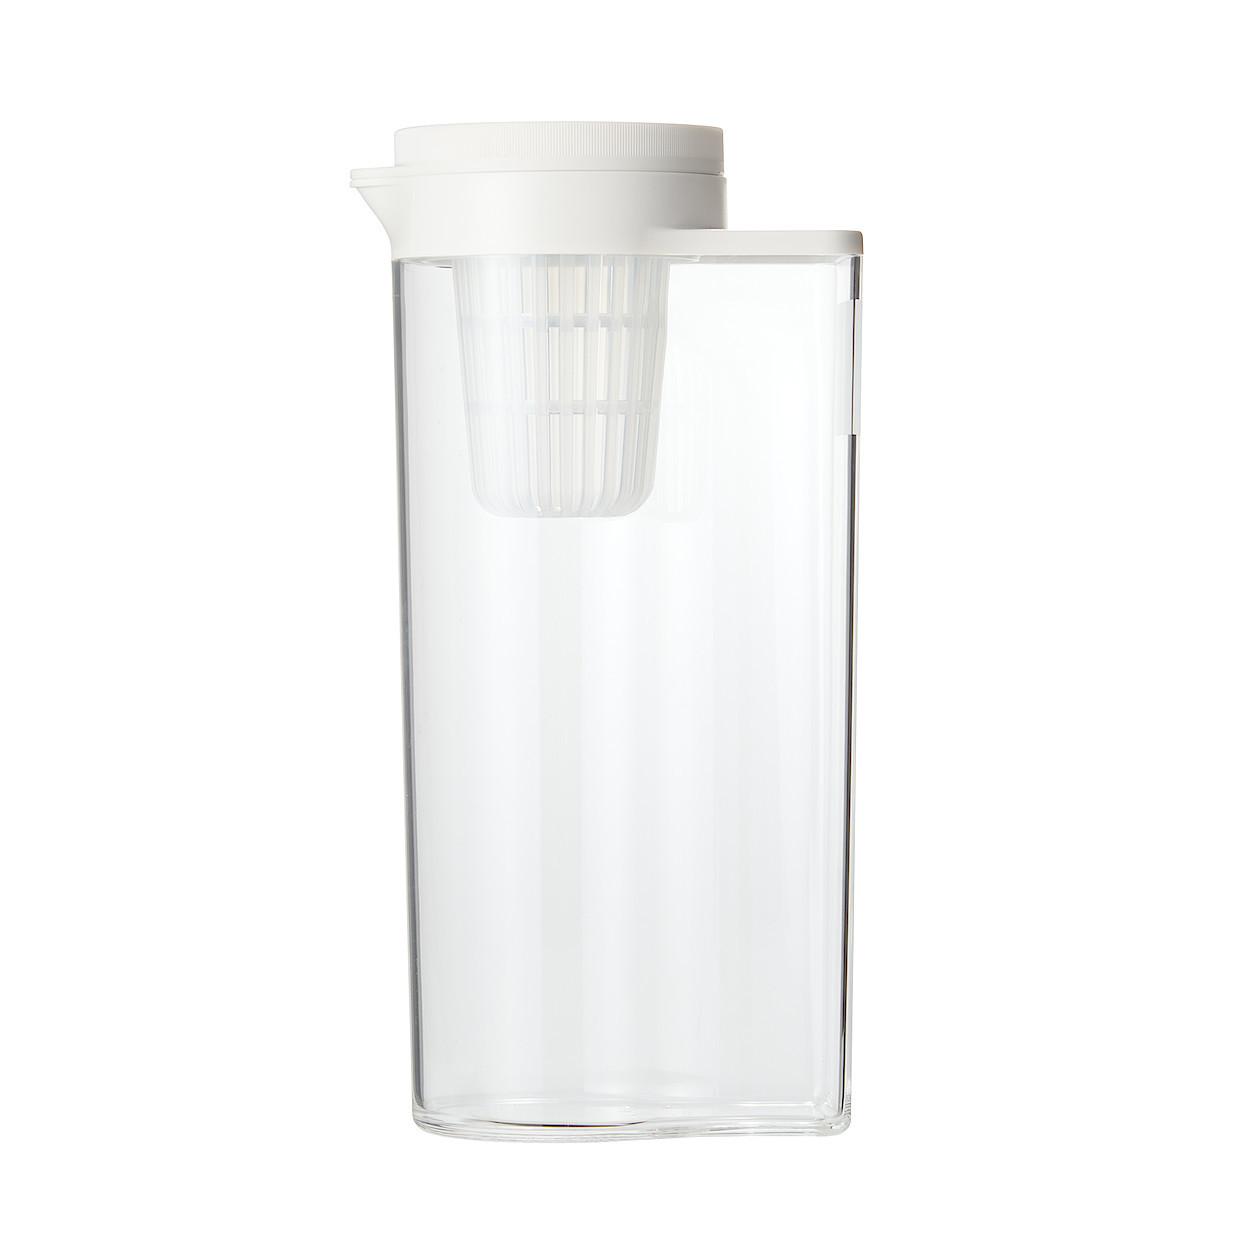 MUJI(無印良品) アクリル冷水筒 冷水専用 約2L